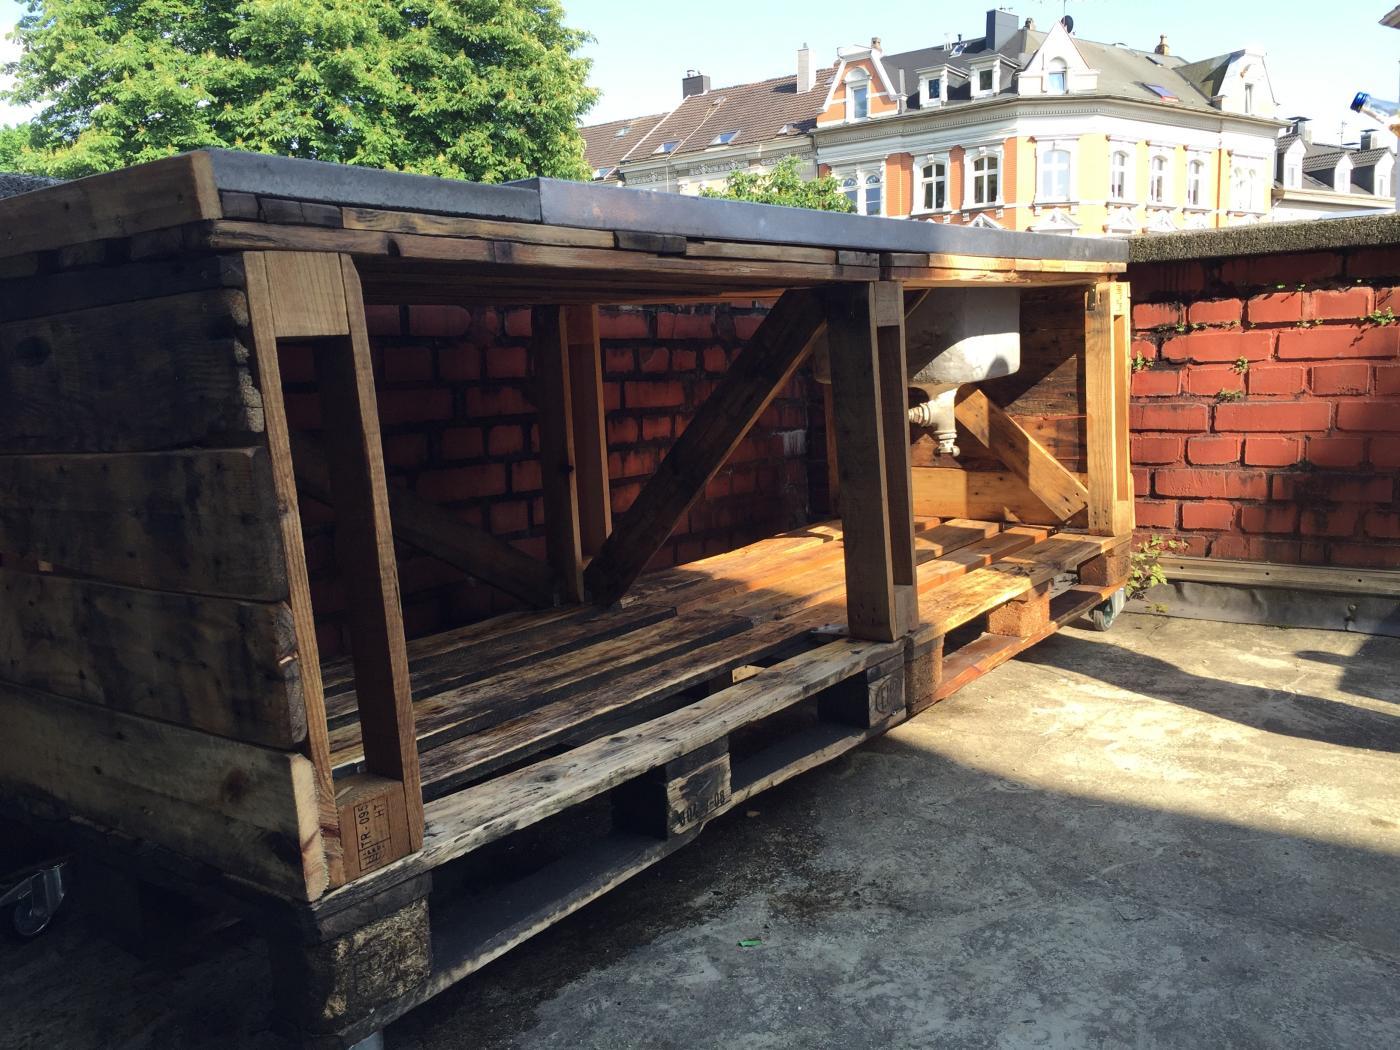 Paletten Workshop Utopiastadt Mobile Trassenkuche Palettenbett Und Palettenmobel Palettenbett Und Palettenmobel